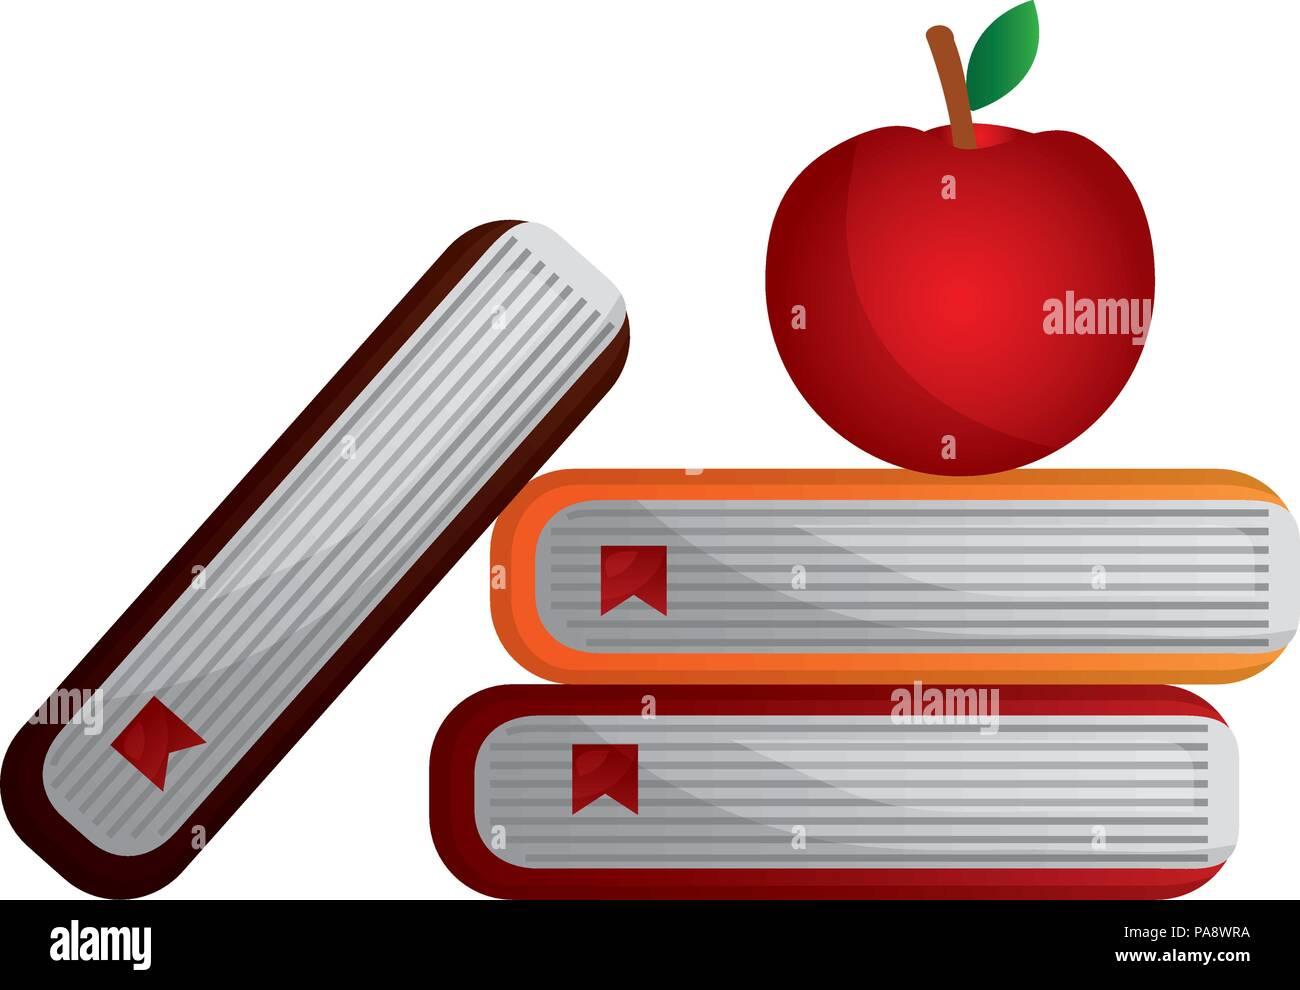 School Books And Apple Symbol Stock Vector Art Illustration